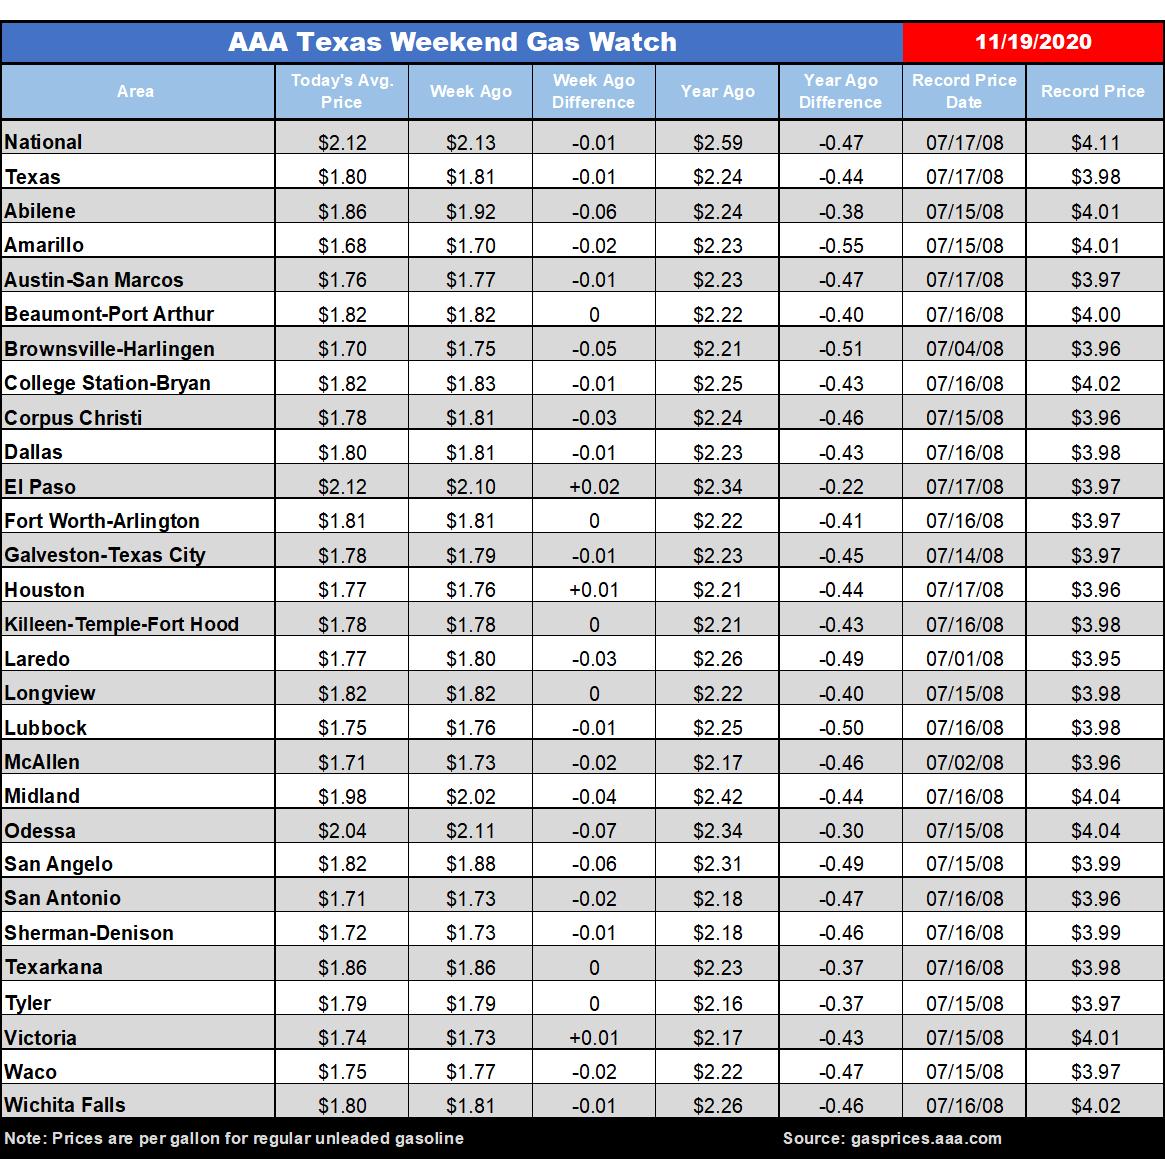 tx gas chart 11_19_2020